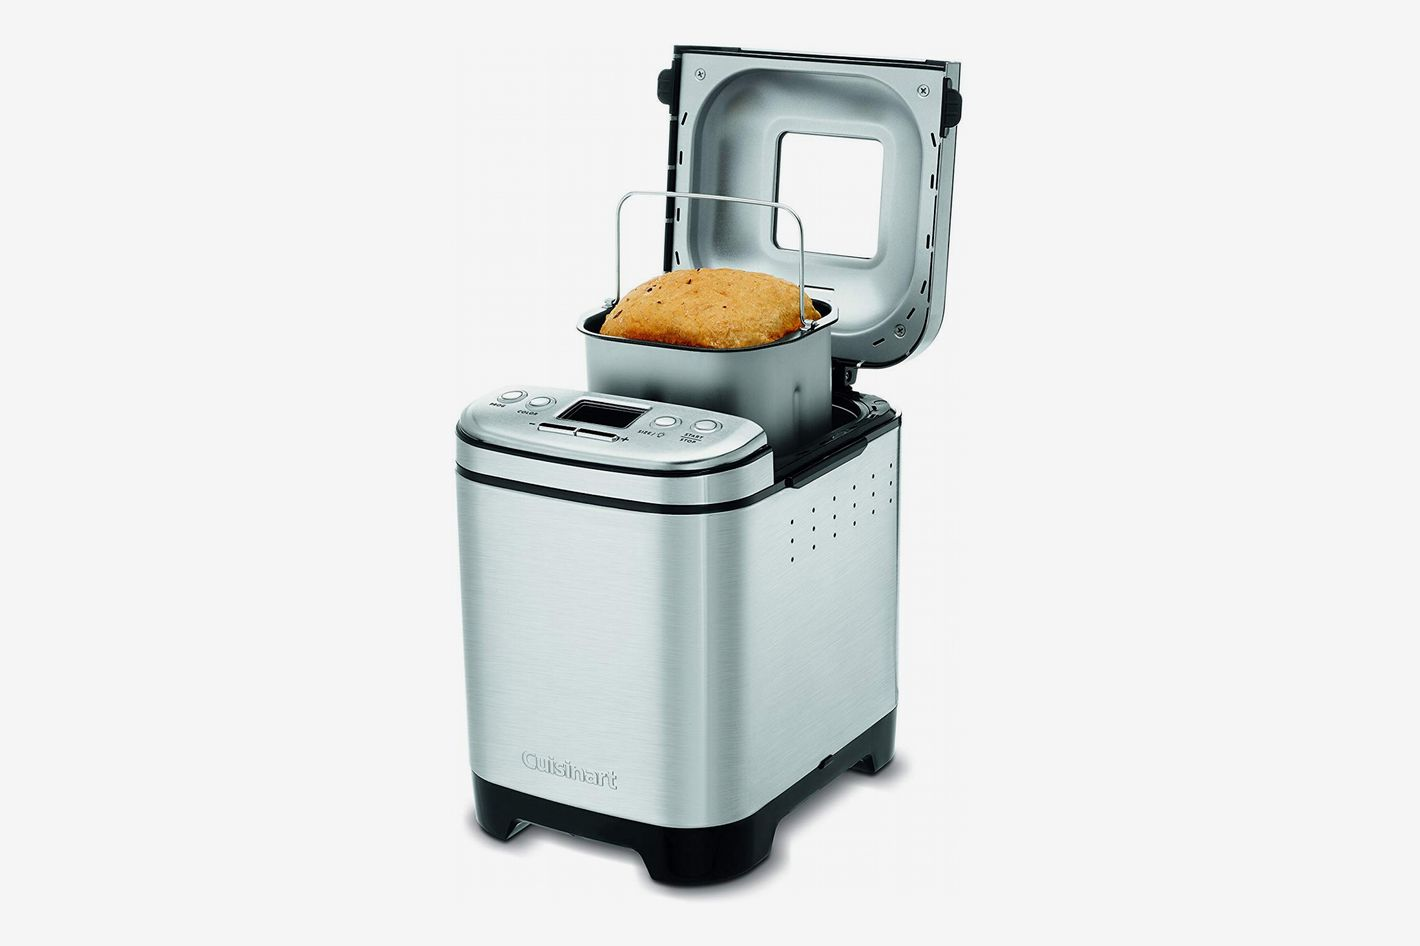 Cuisinart Compact Automatic Bread Maker Silver